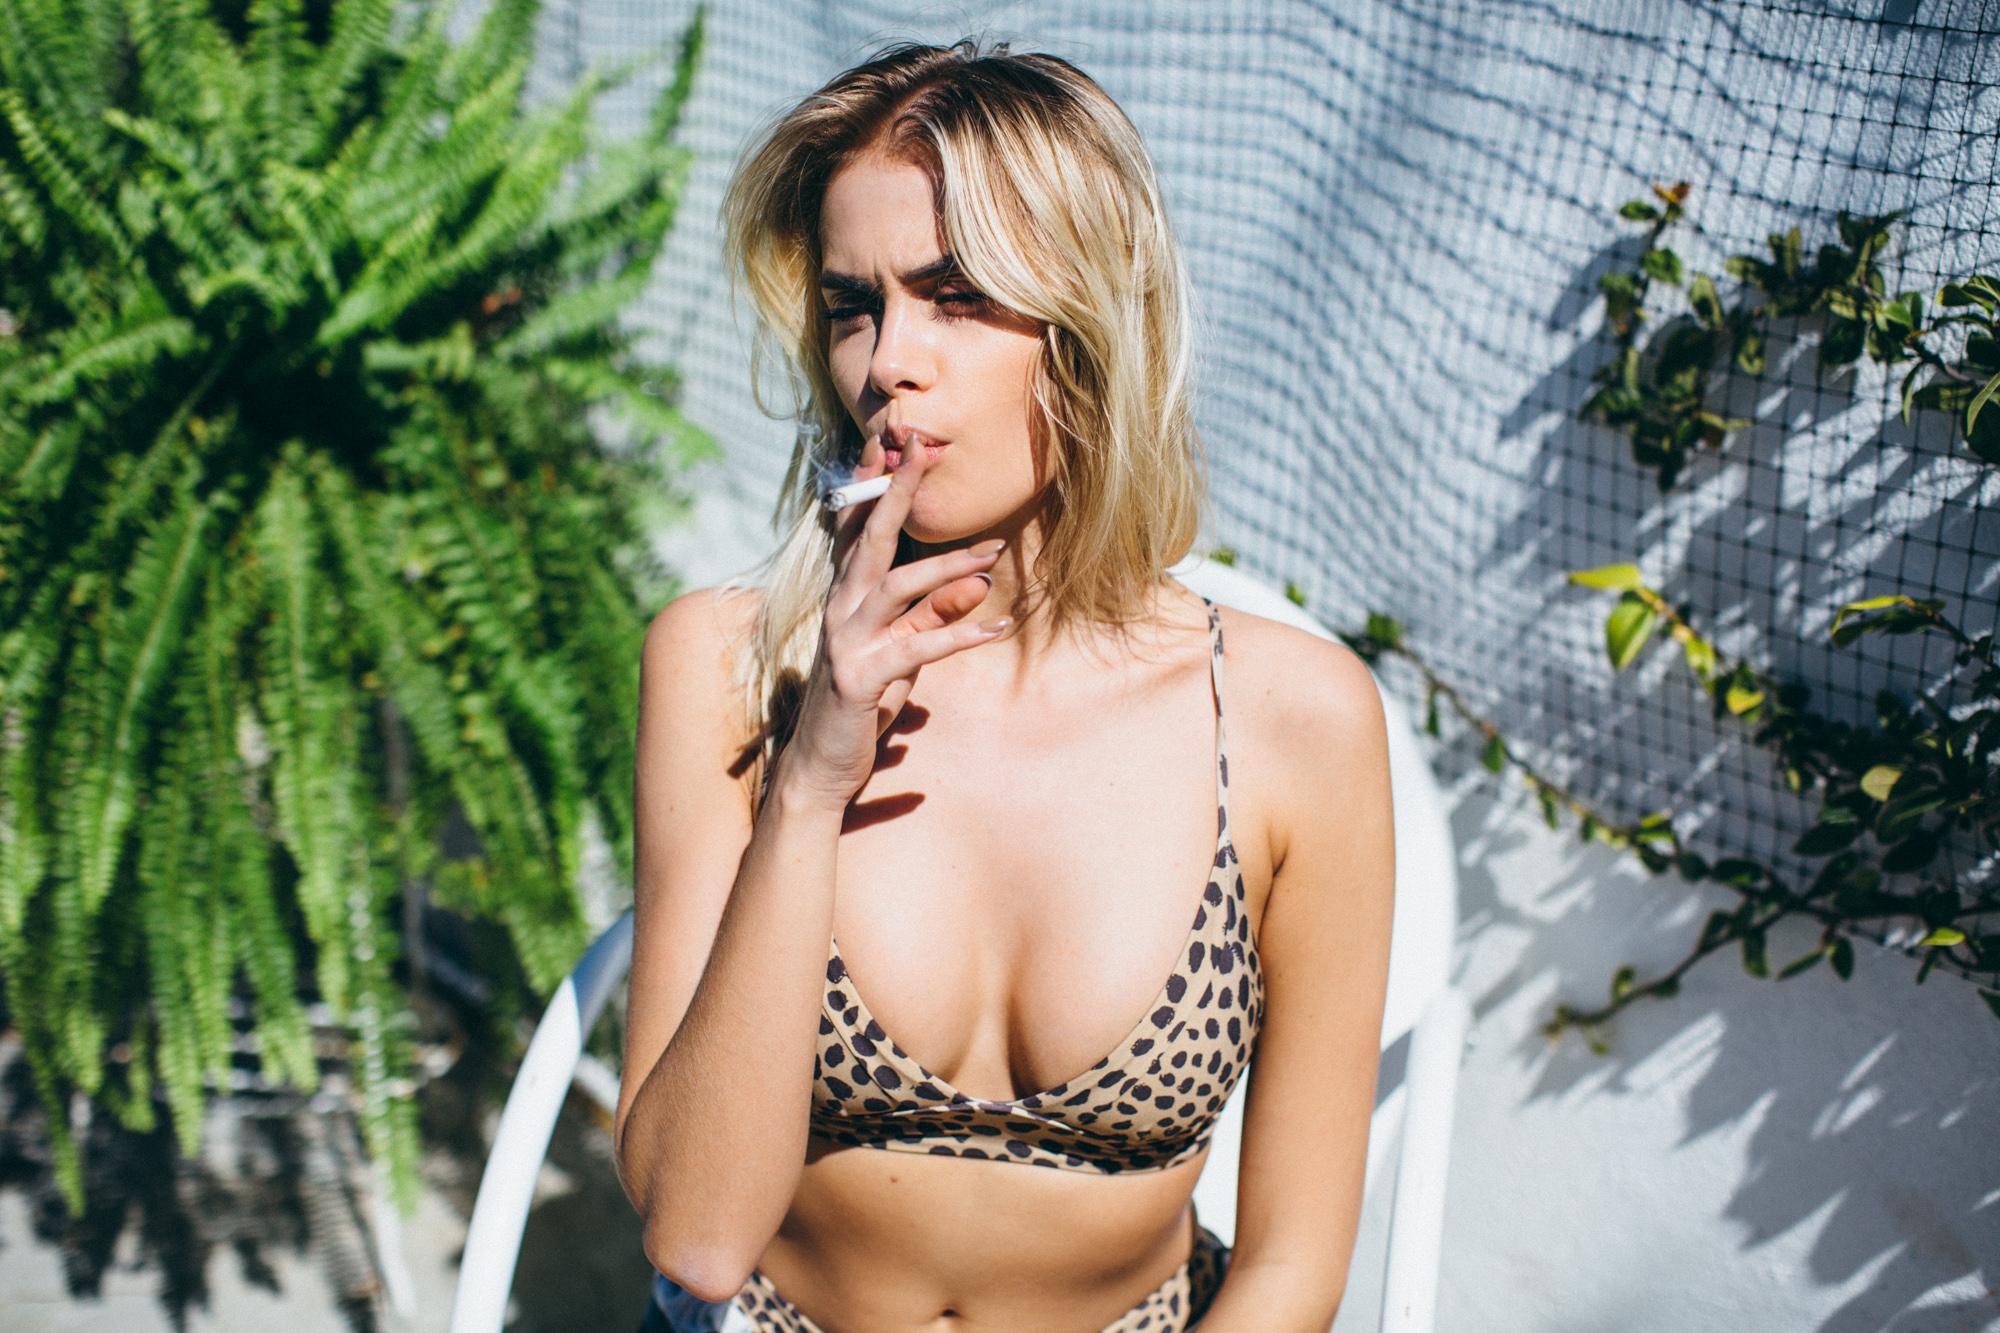 Sophia Sinclair for Playboy